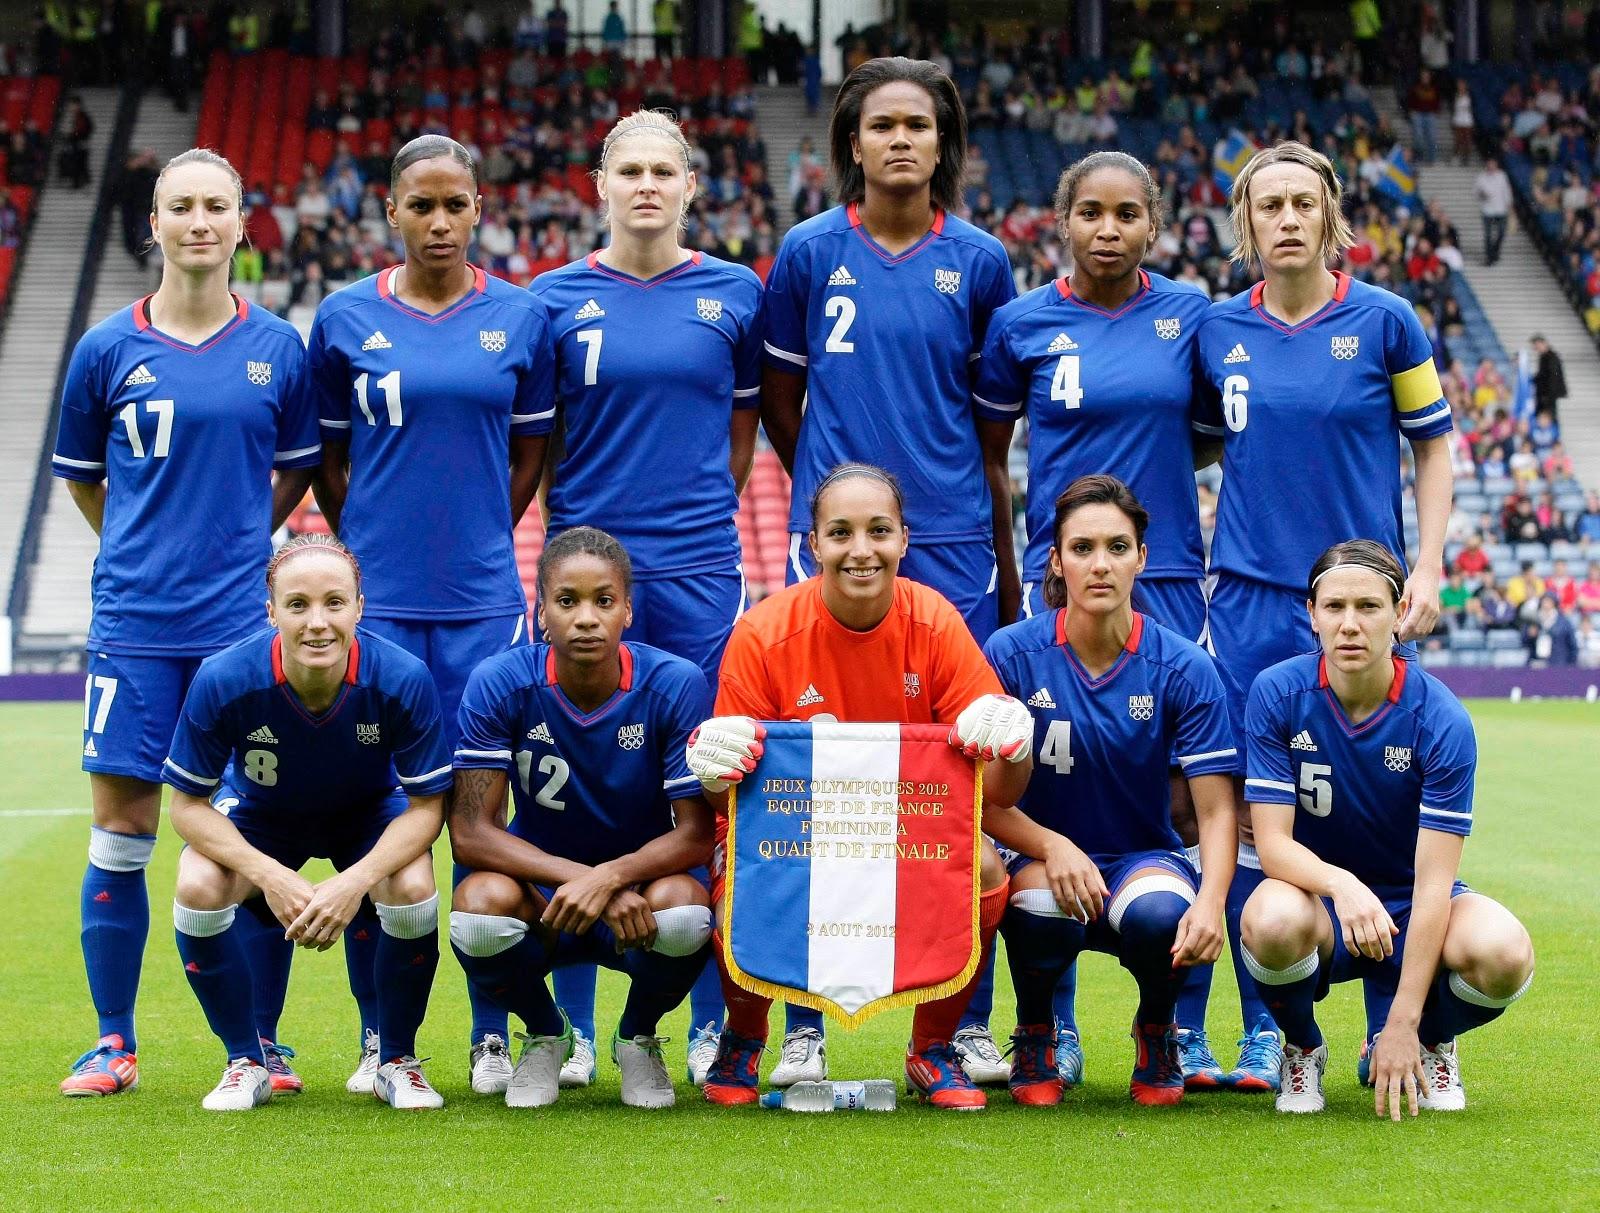 France 2016 Olympics Kits + Lacoste Deal Revealed - Footy Headlines